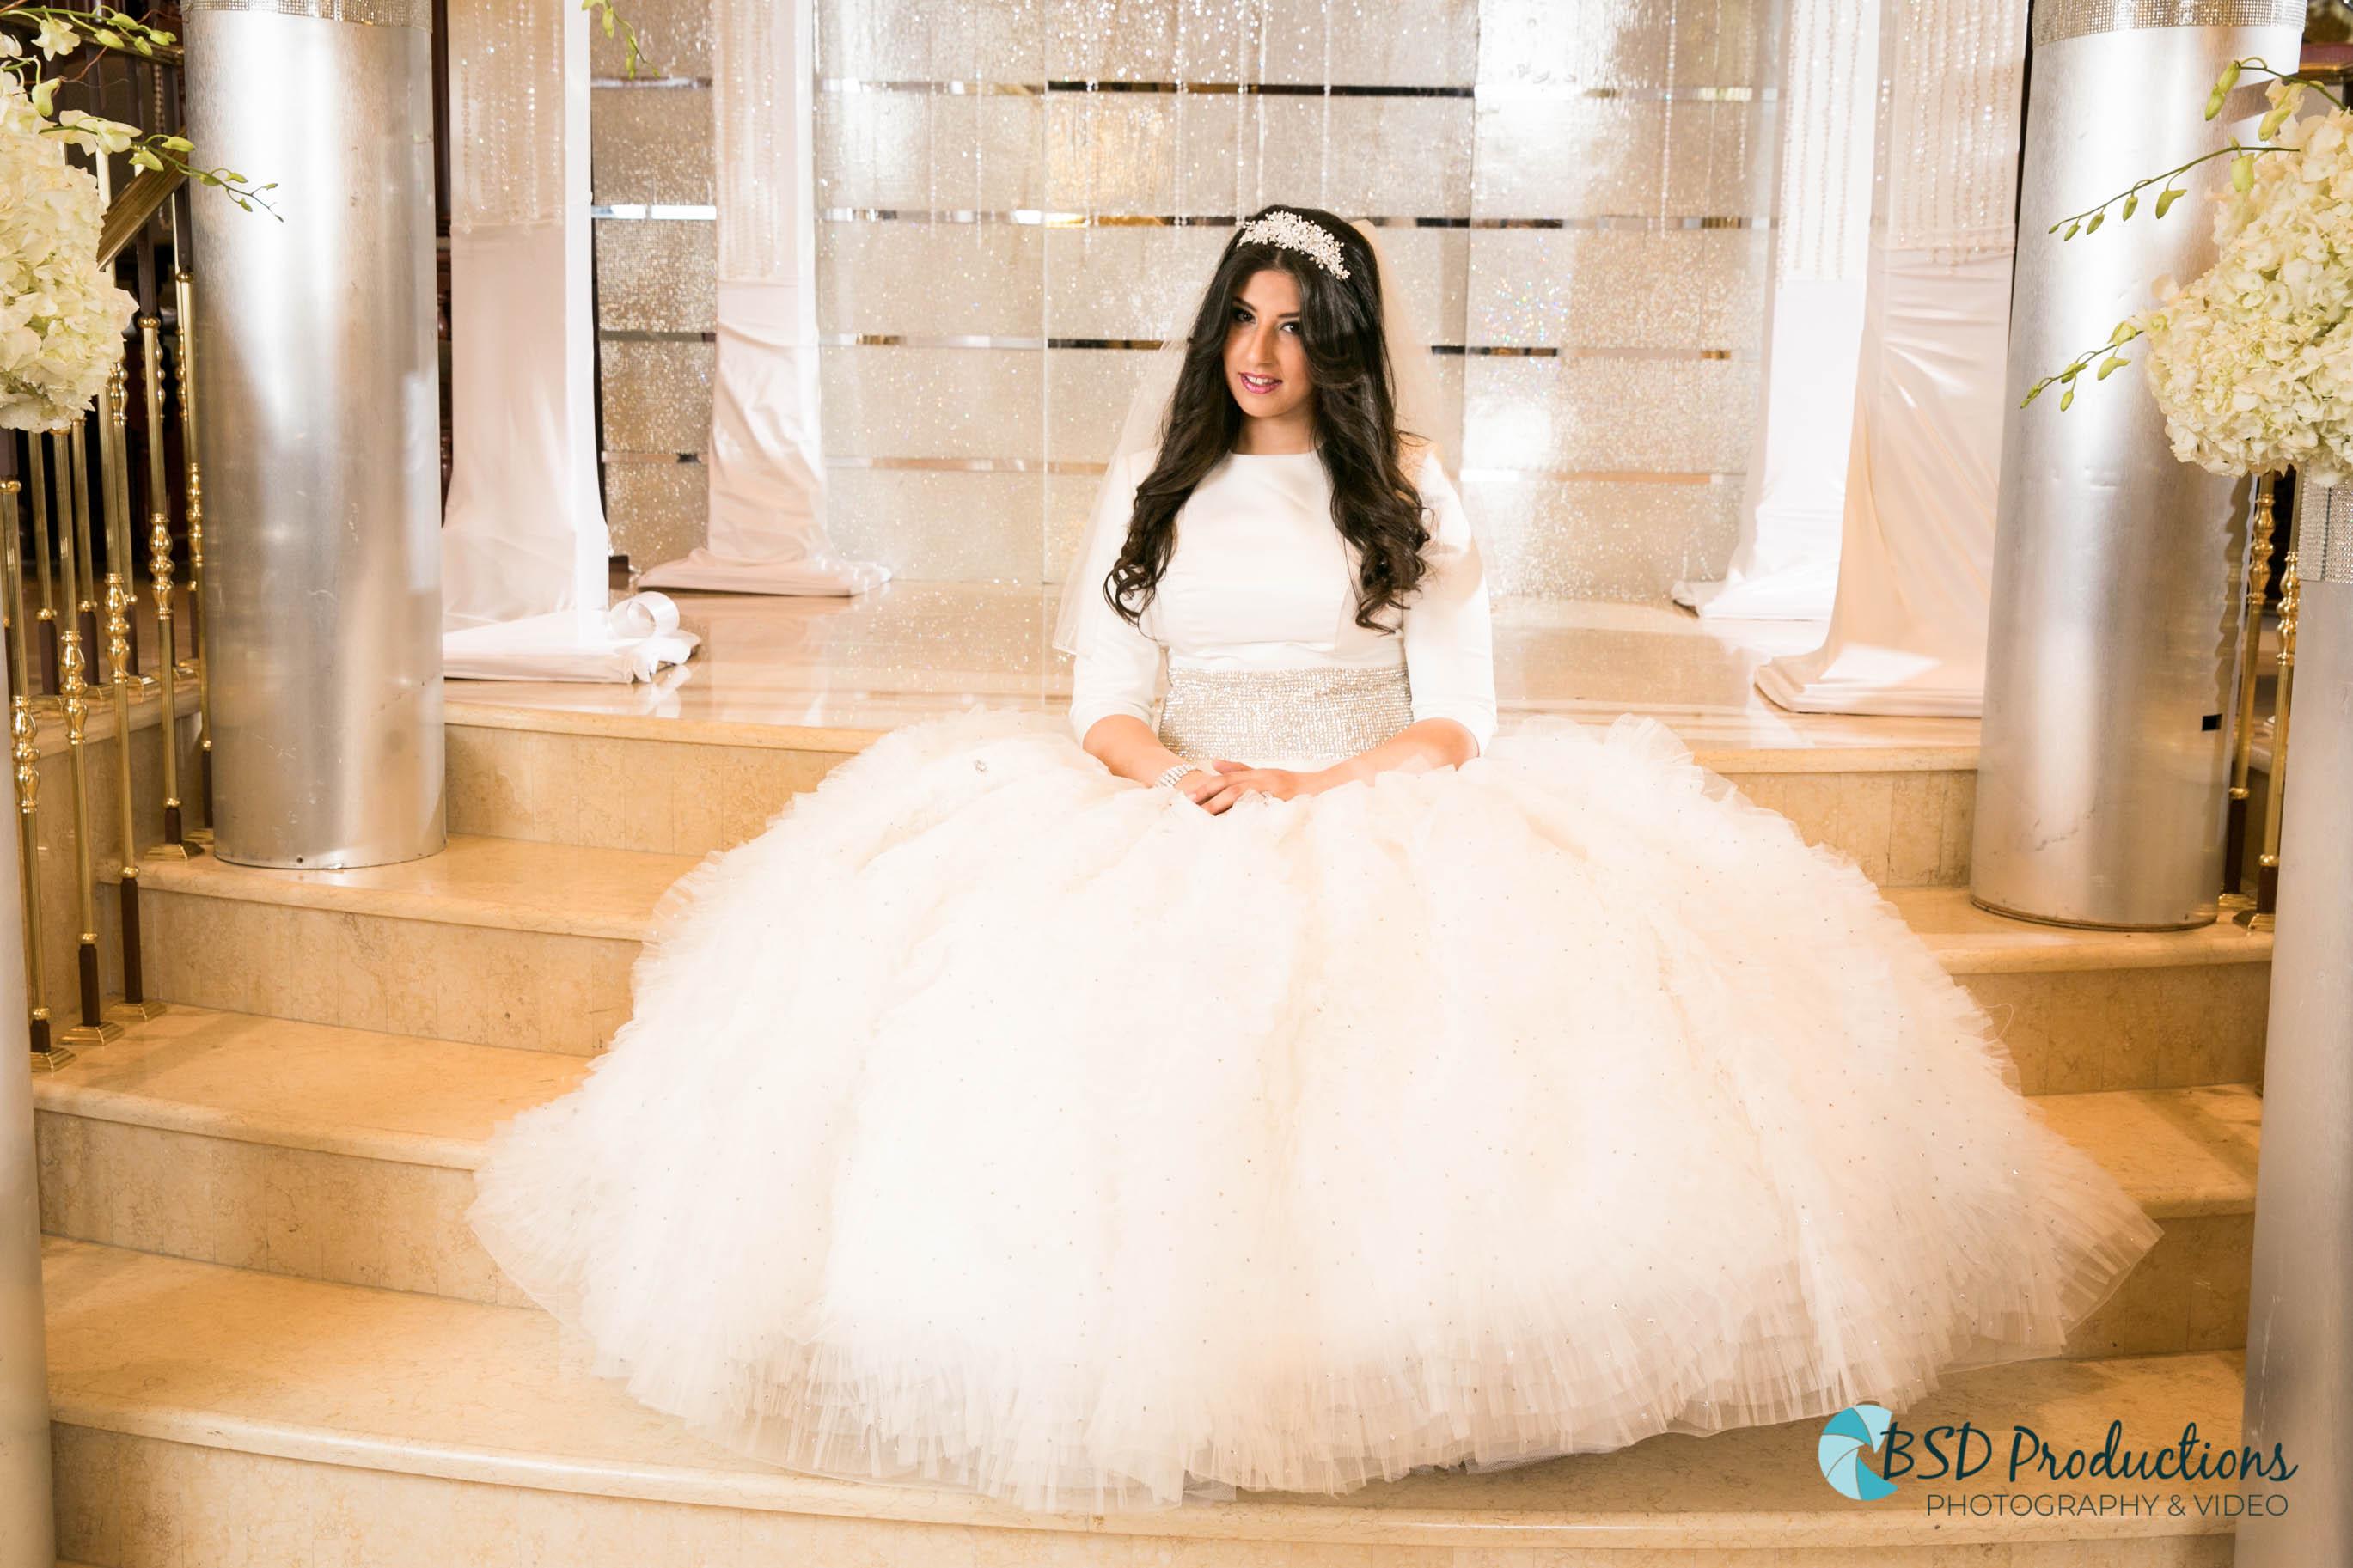 DAV_4330 Wedding – BSD Productions Photography